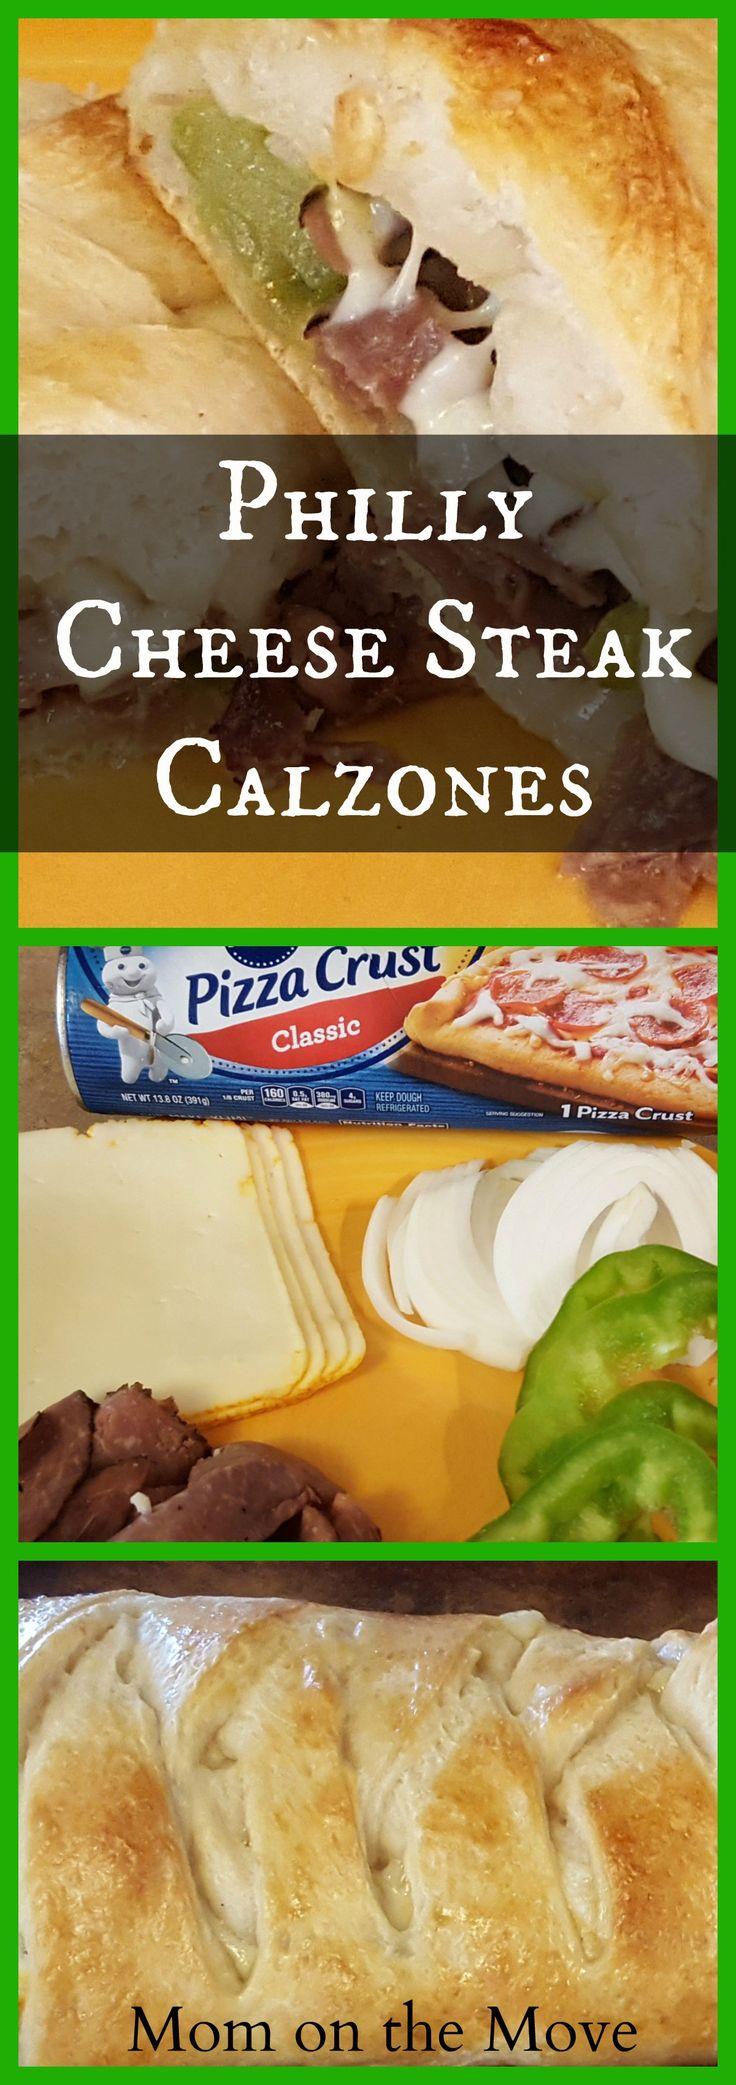 philly cheese steak calzones